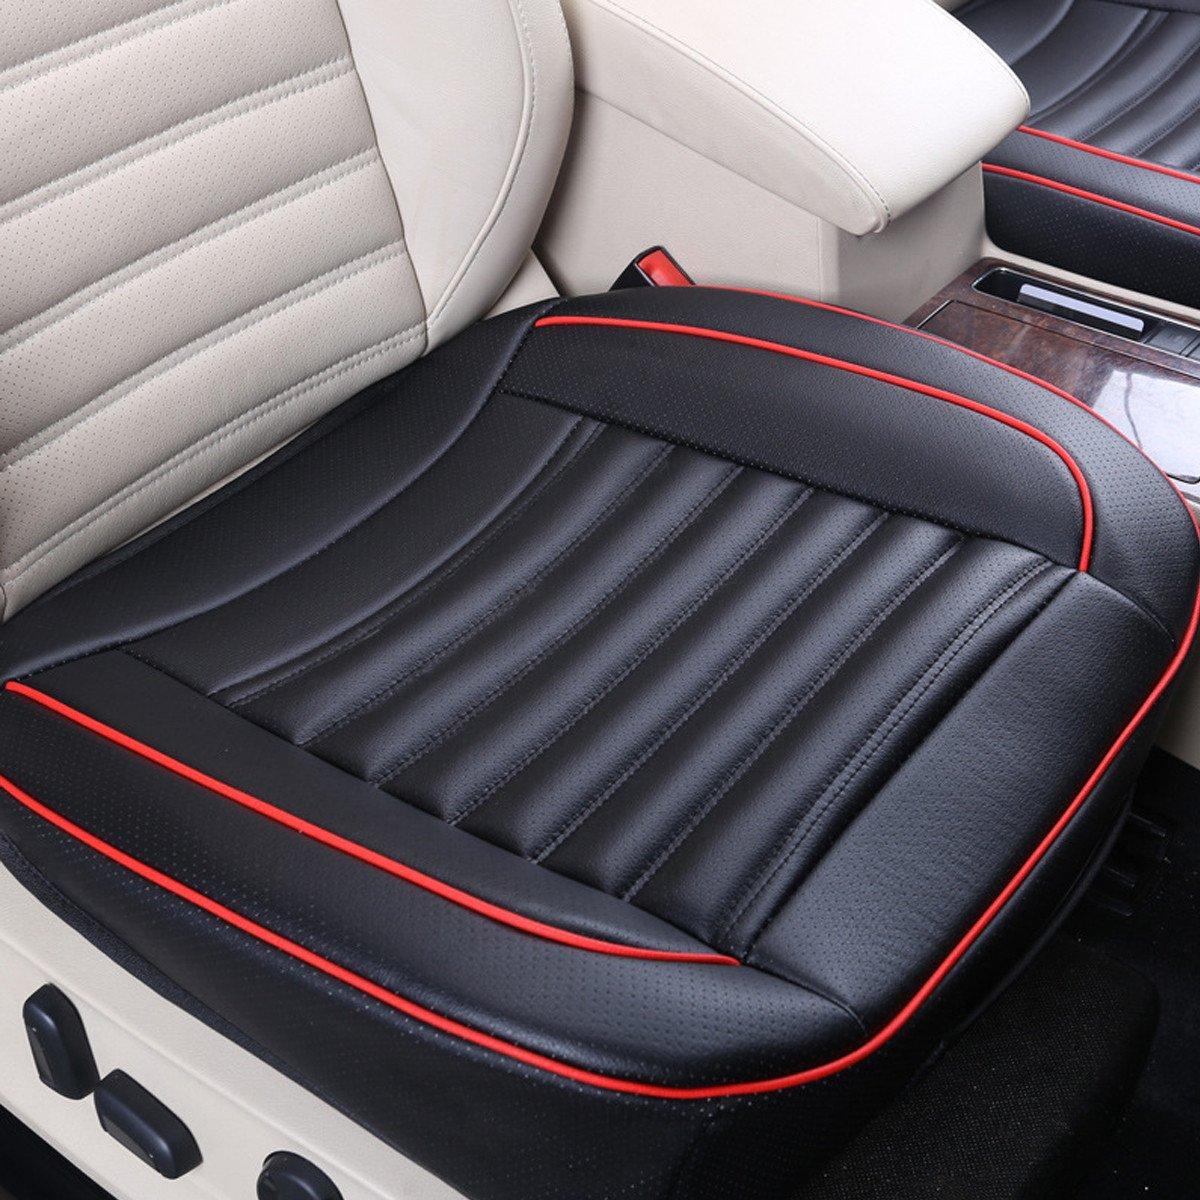 ZHENWOCAI 50x50cm PU Leather Buckwhear Shell Filling Car Cushion Chair Car Seat Cover Auto Interior Pad Mat New (Color : Black)